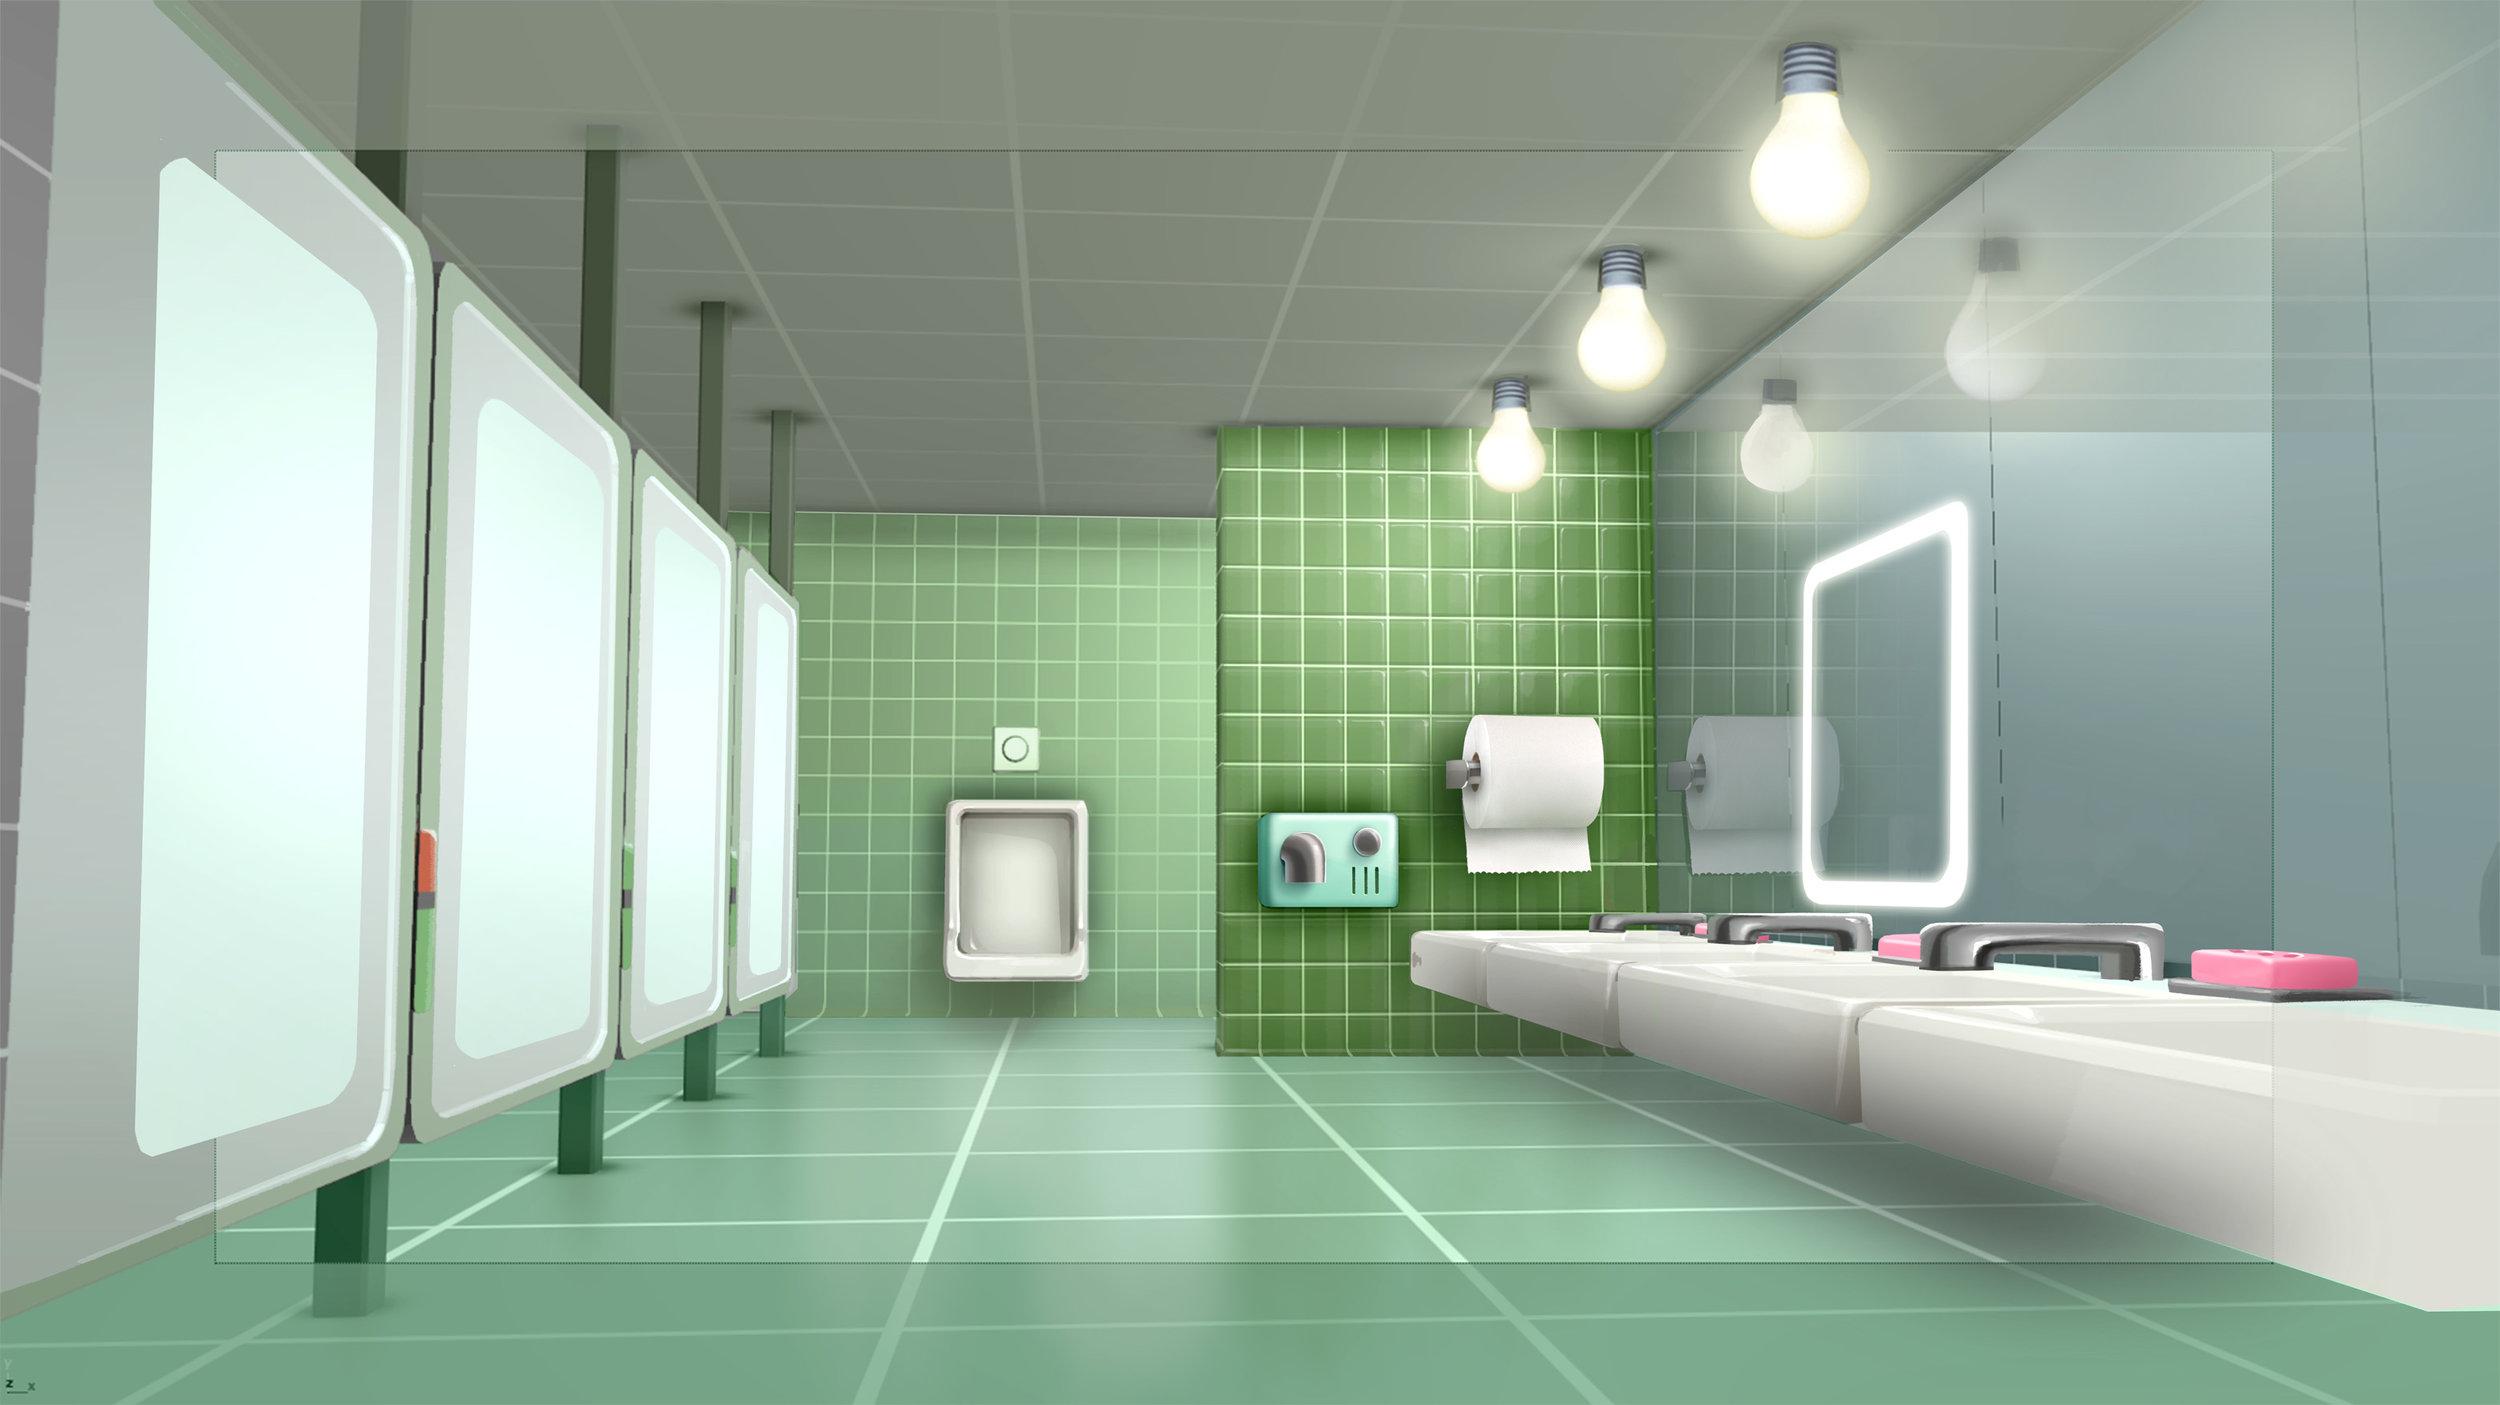 Emoji office bathroom design / paint